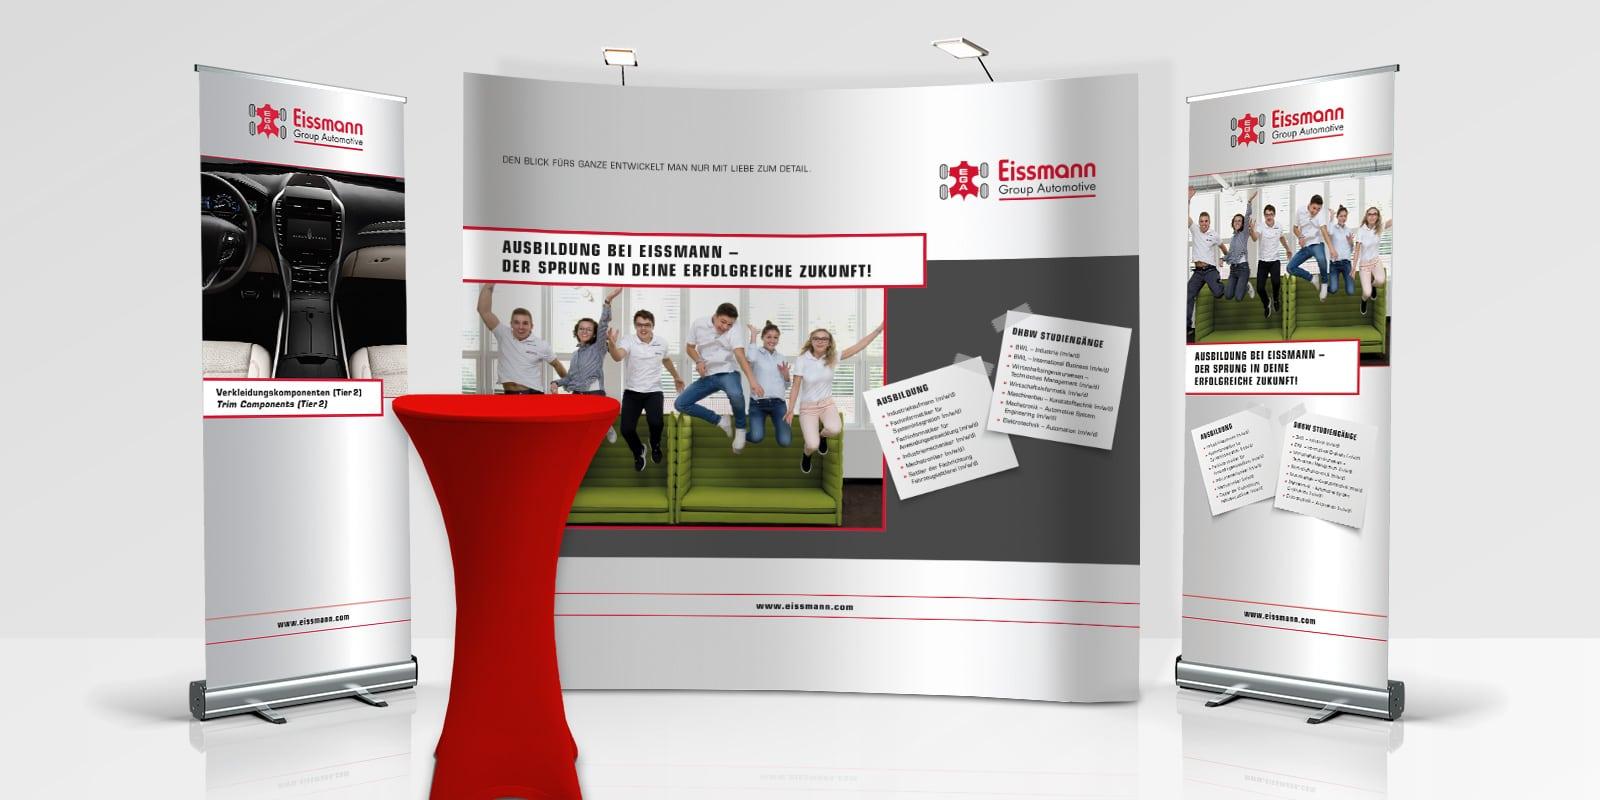 Eissmann – Personalmesse